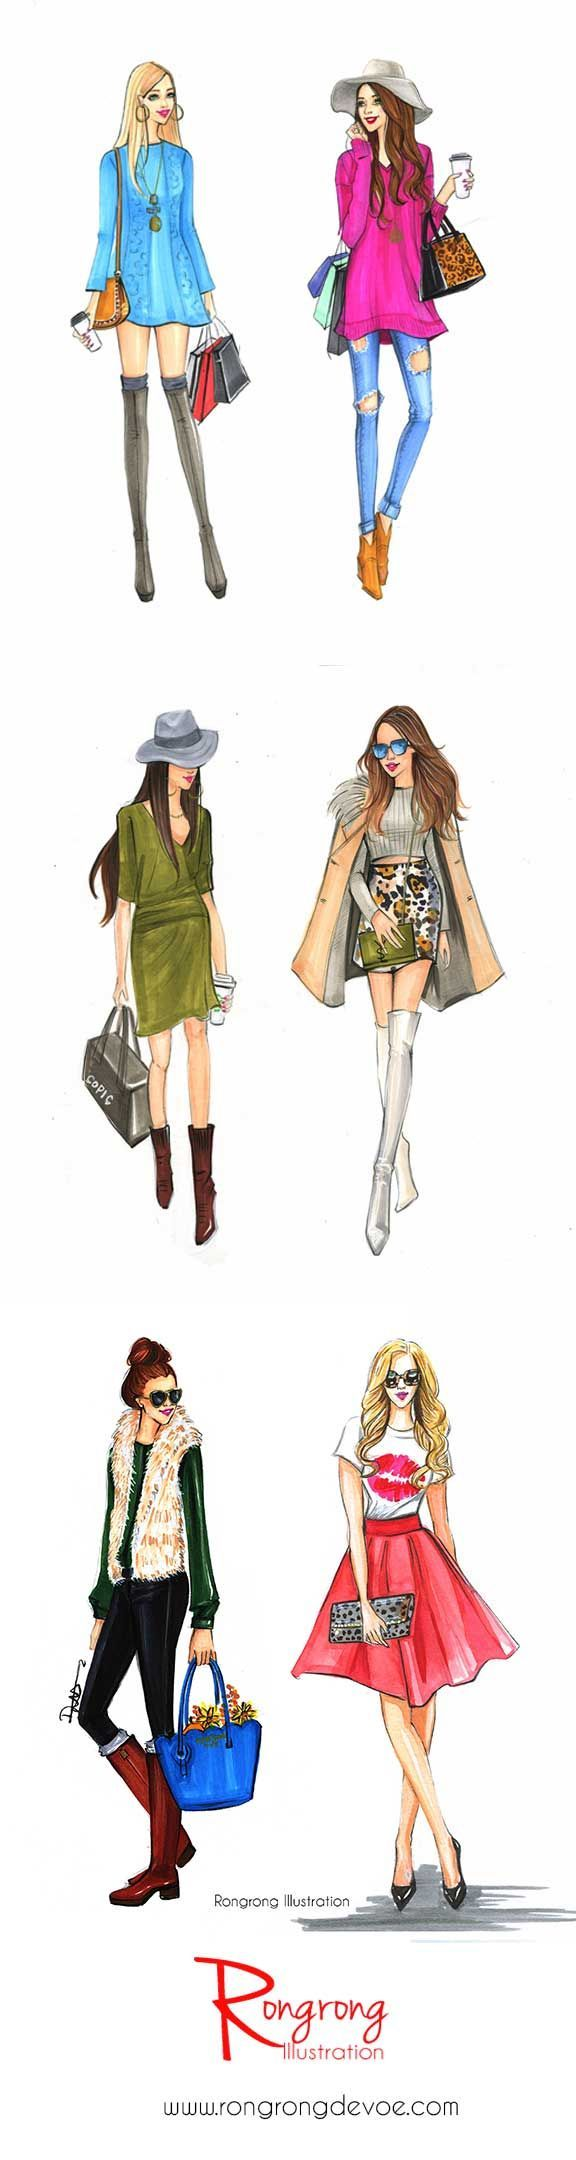 Street fashion styles illustrations by Houston fashion illustrator Rongrogn DeVoe. more at www.rongrongillus…